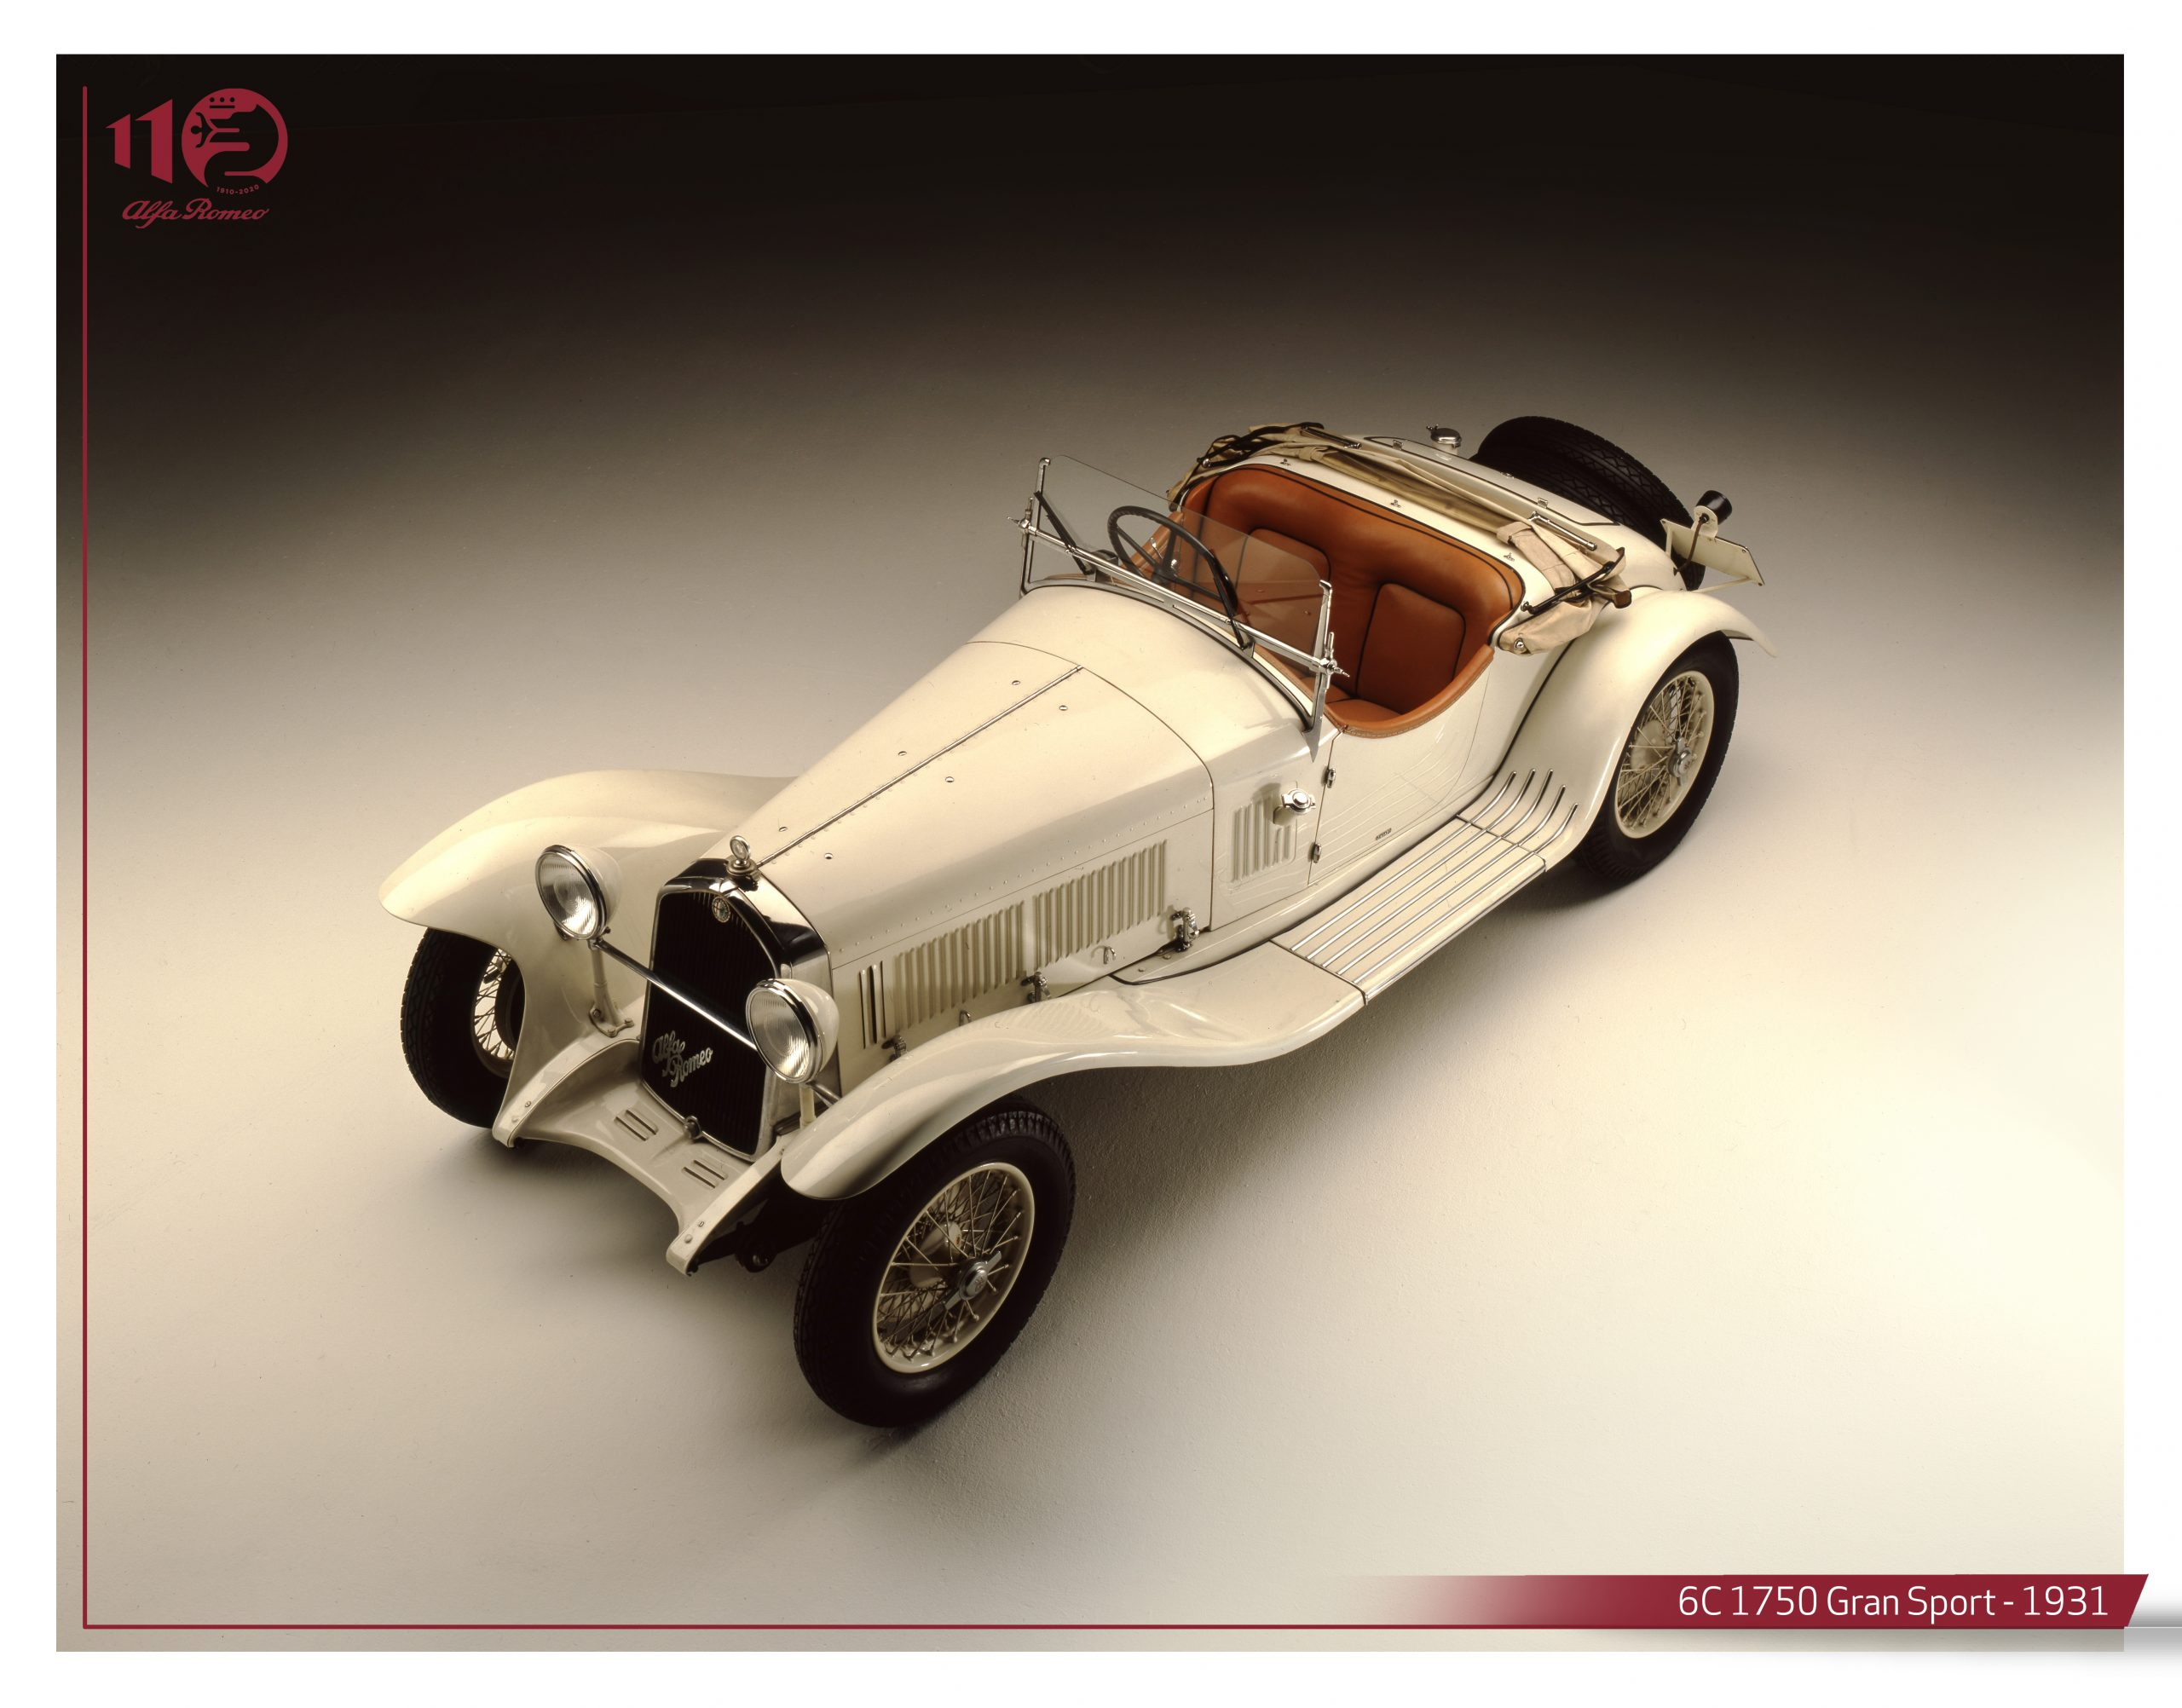 Alfa Romeo 6c gran sport del 1931